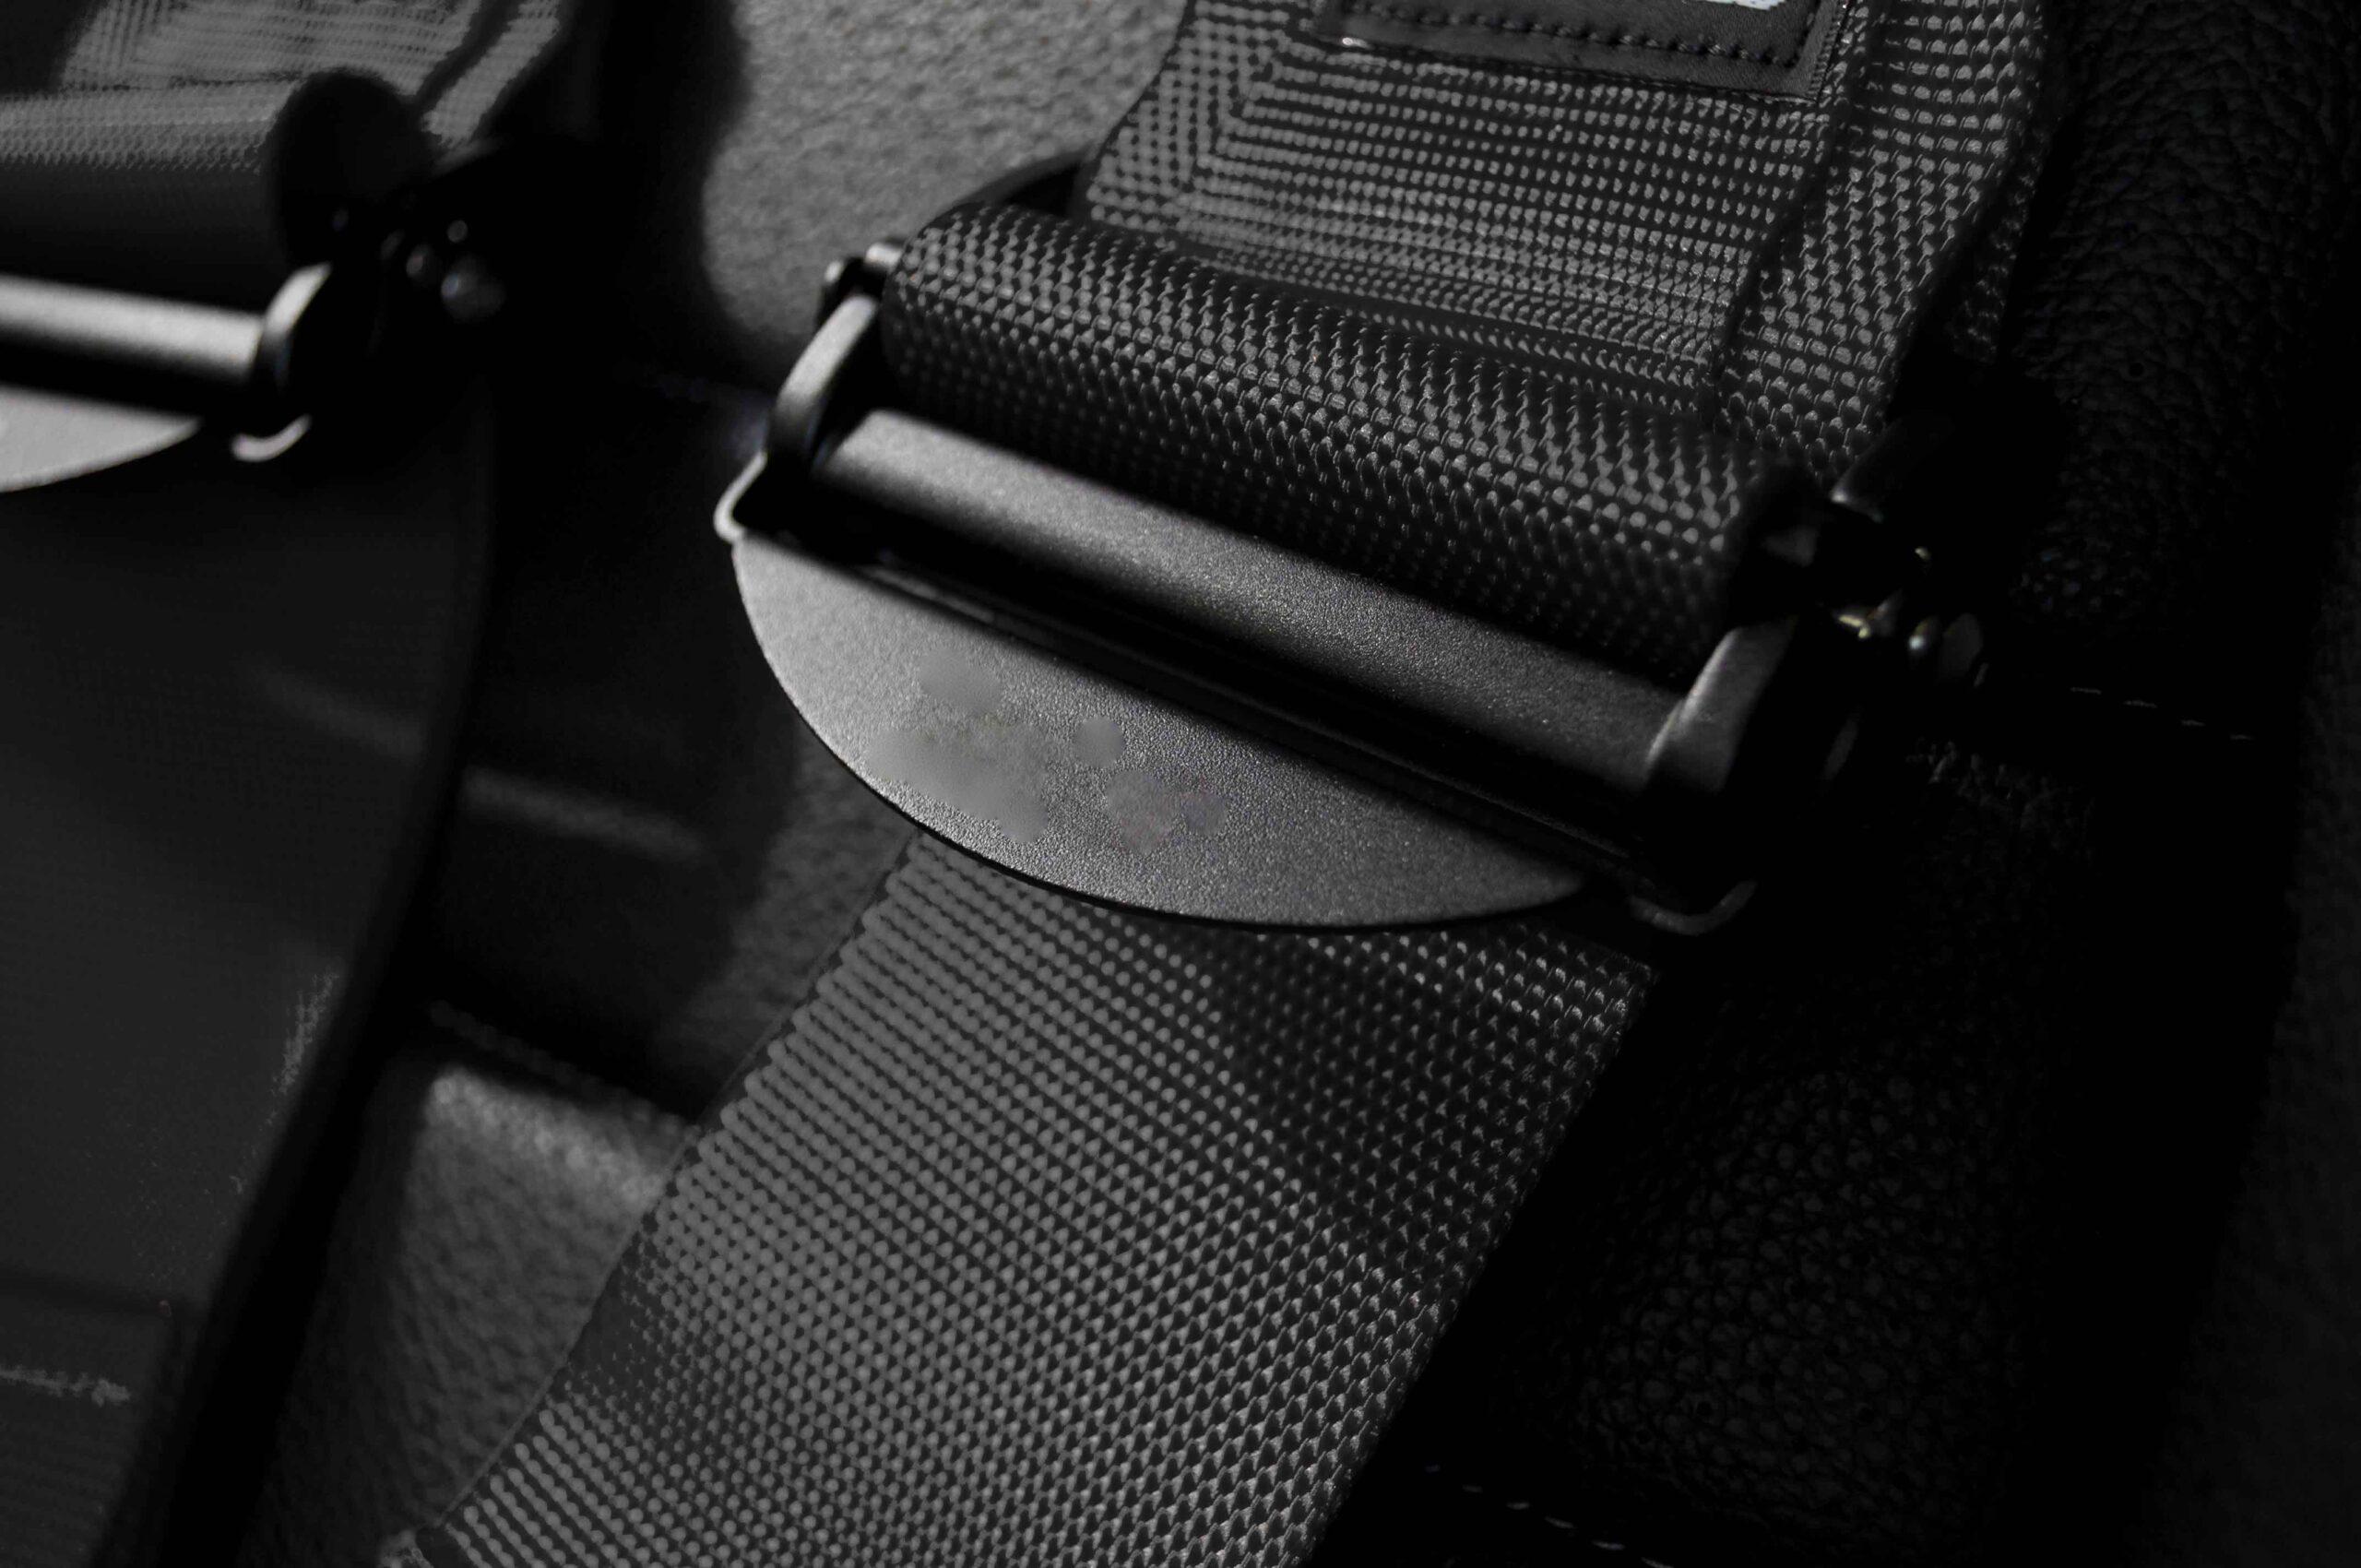 Race-Harness-Shoulder-Adjusters-Lightweight-Red-Square